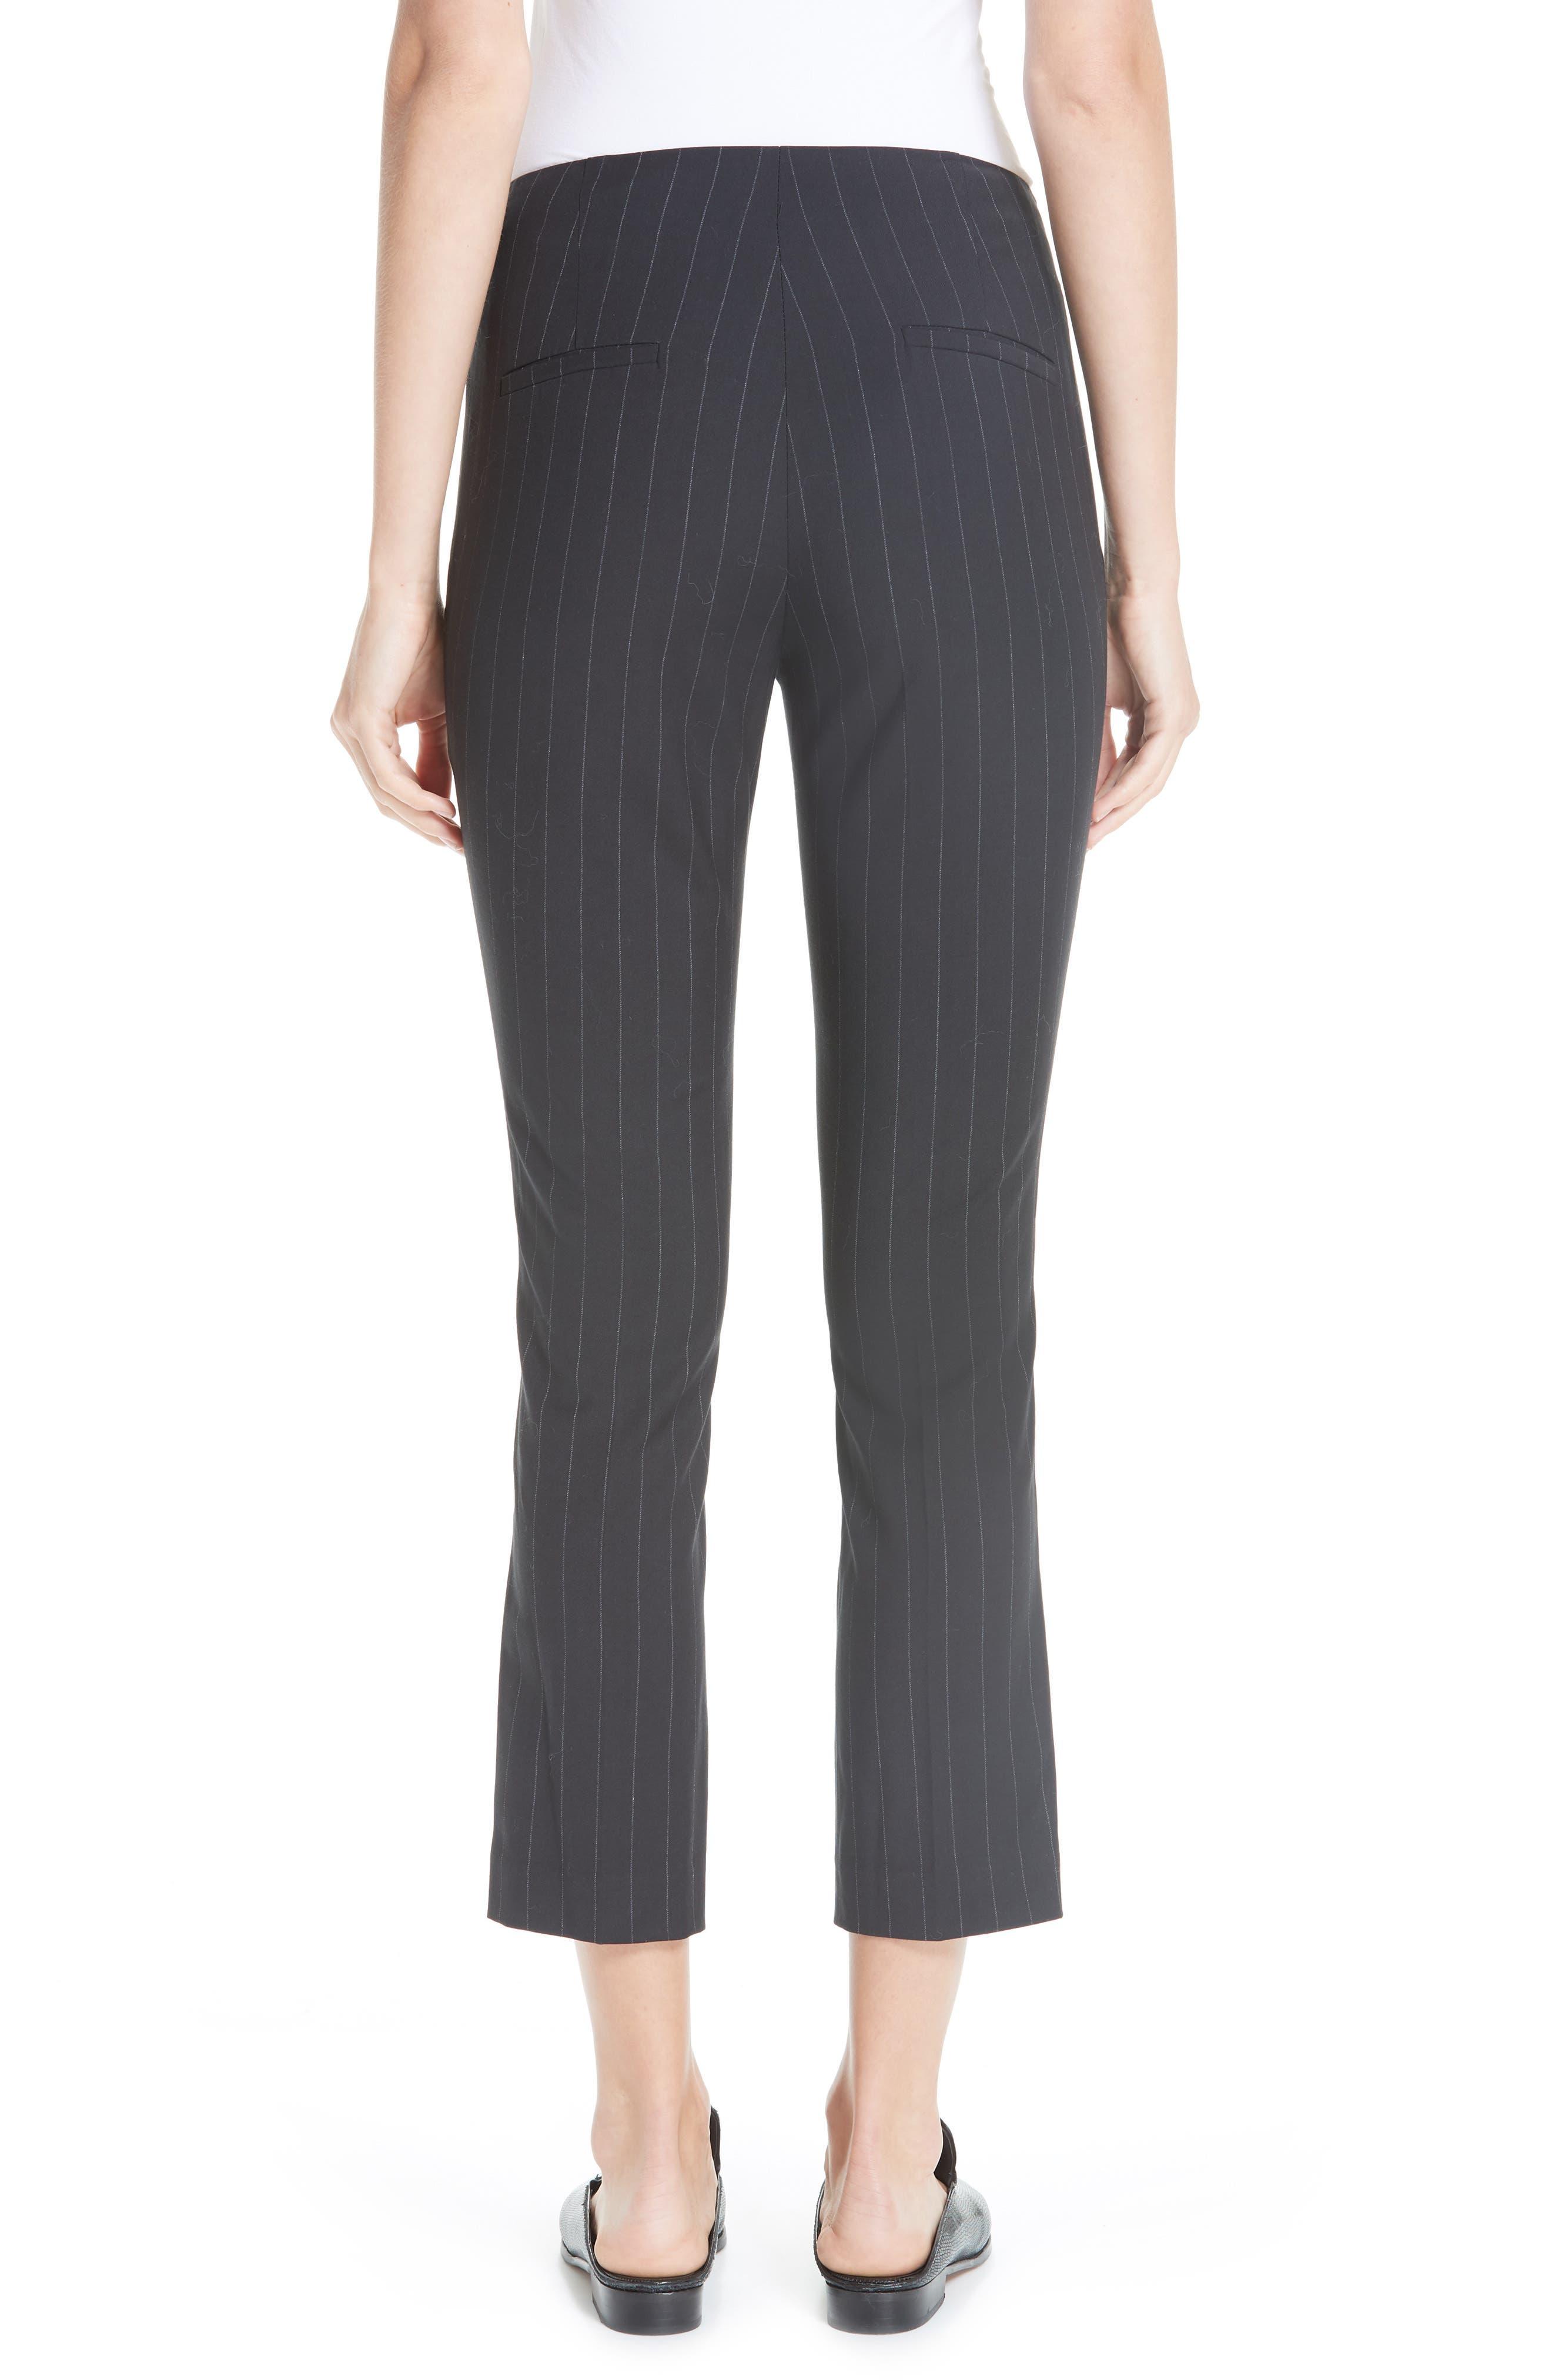 Bango Pinstripe Crop Trousers,                             Alternate thumbnail 2, color,                             001